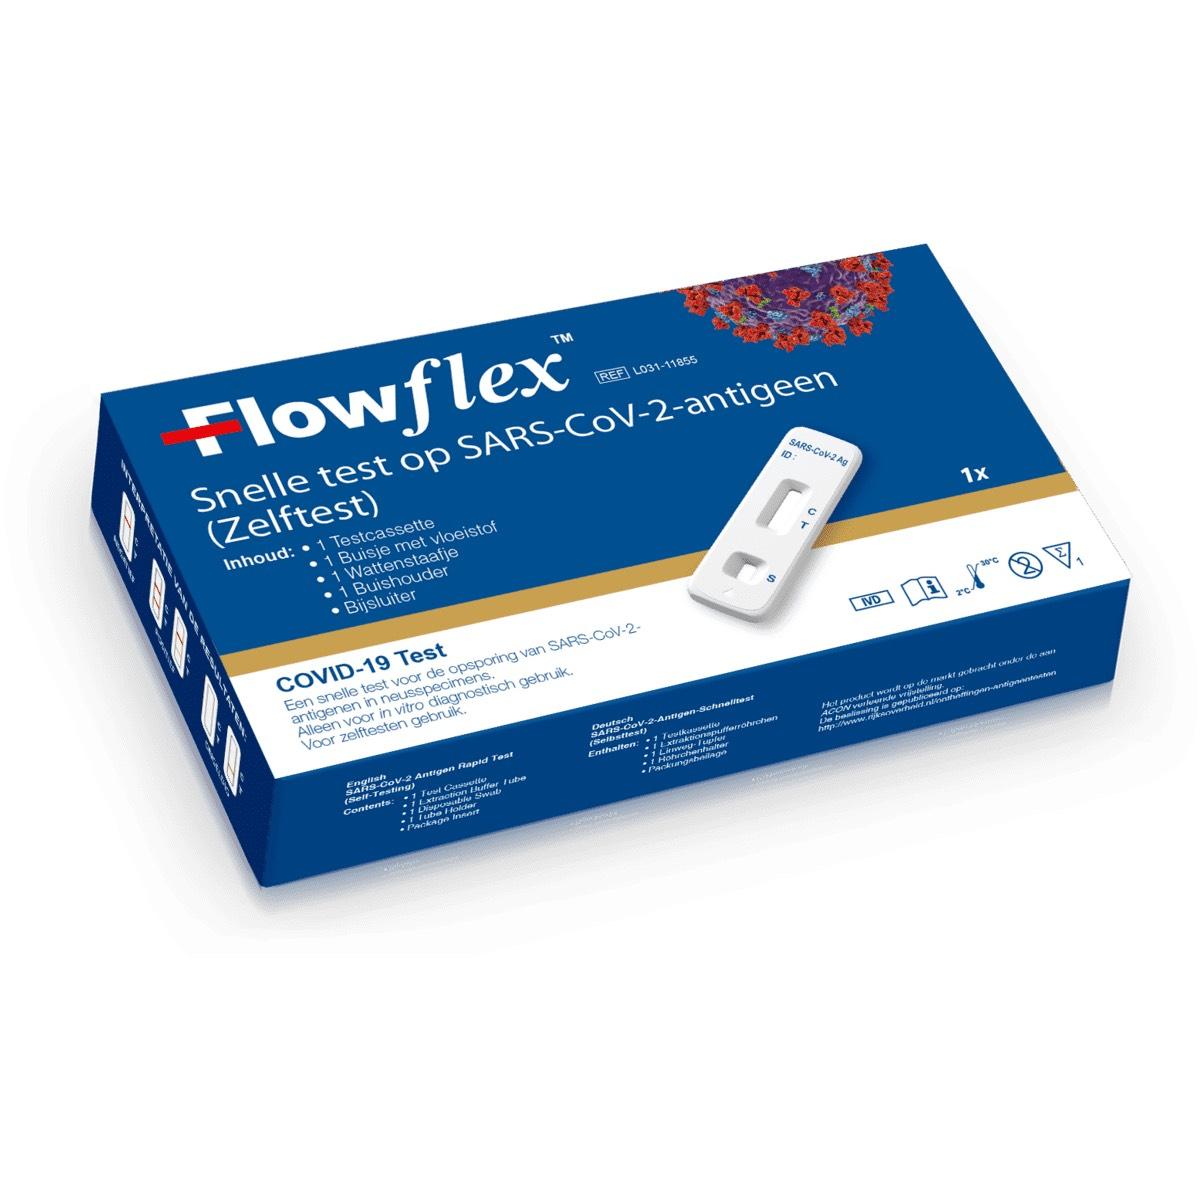 Corona zelftest x 5, merk: FlowFlex.